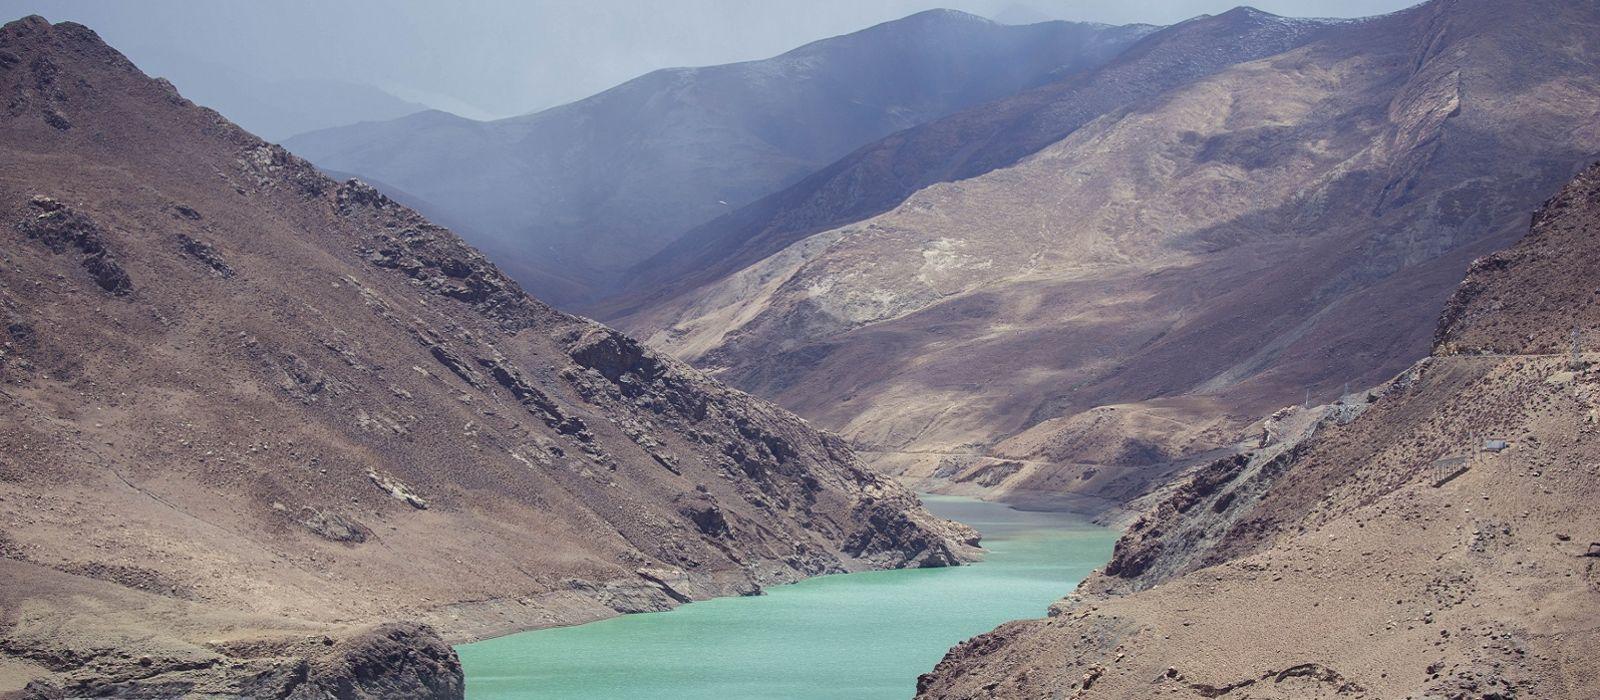 Das The Oberoi Hotels & Resorts Sommerangebot: Im Himalaya Gebirge Urlaub 5